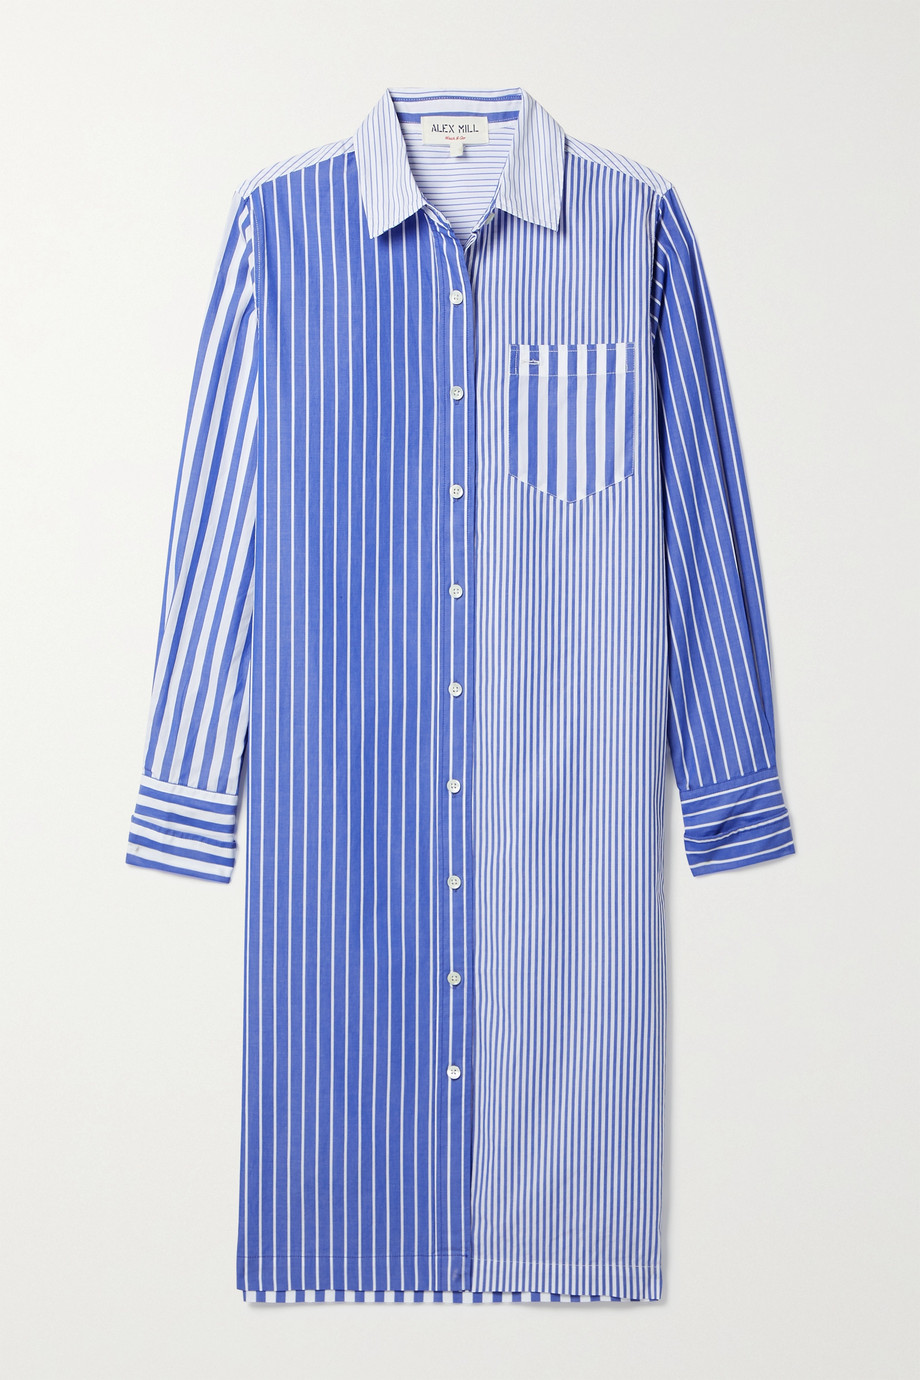 Alex Mill Kelsey striped cotton shirt dress